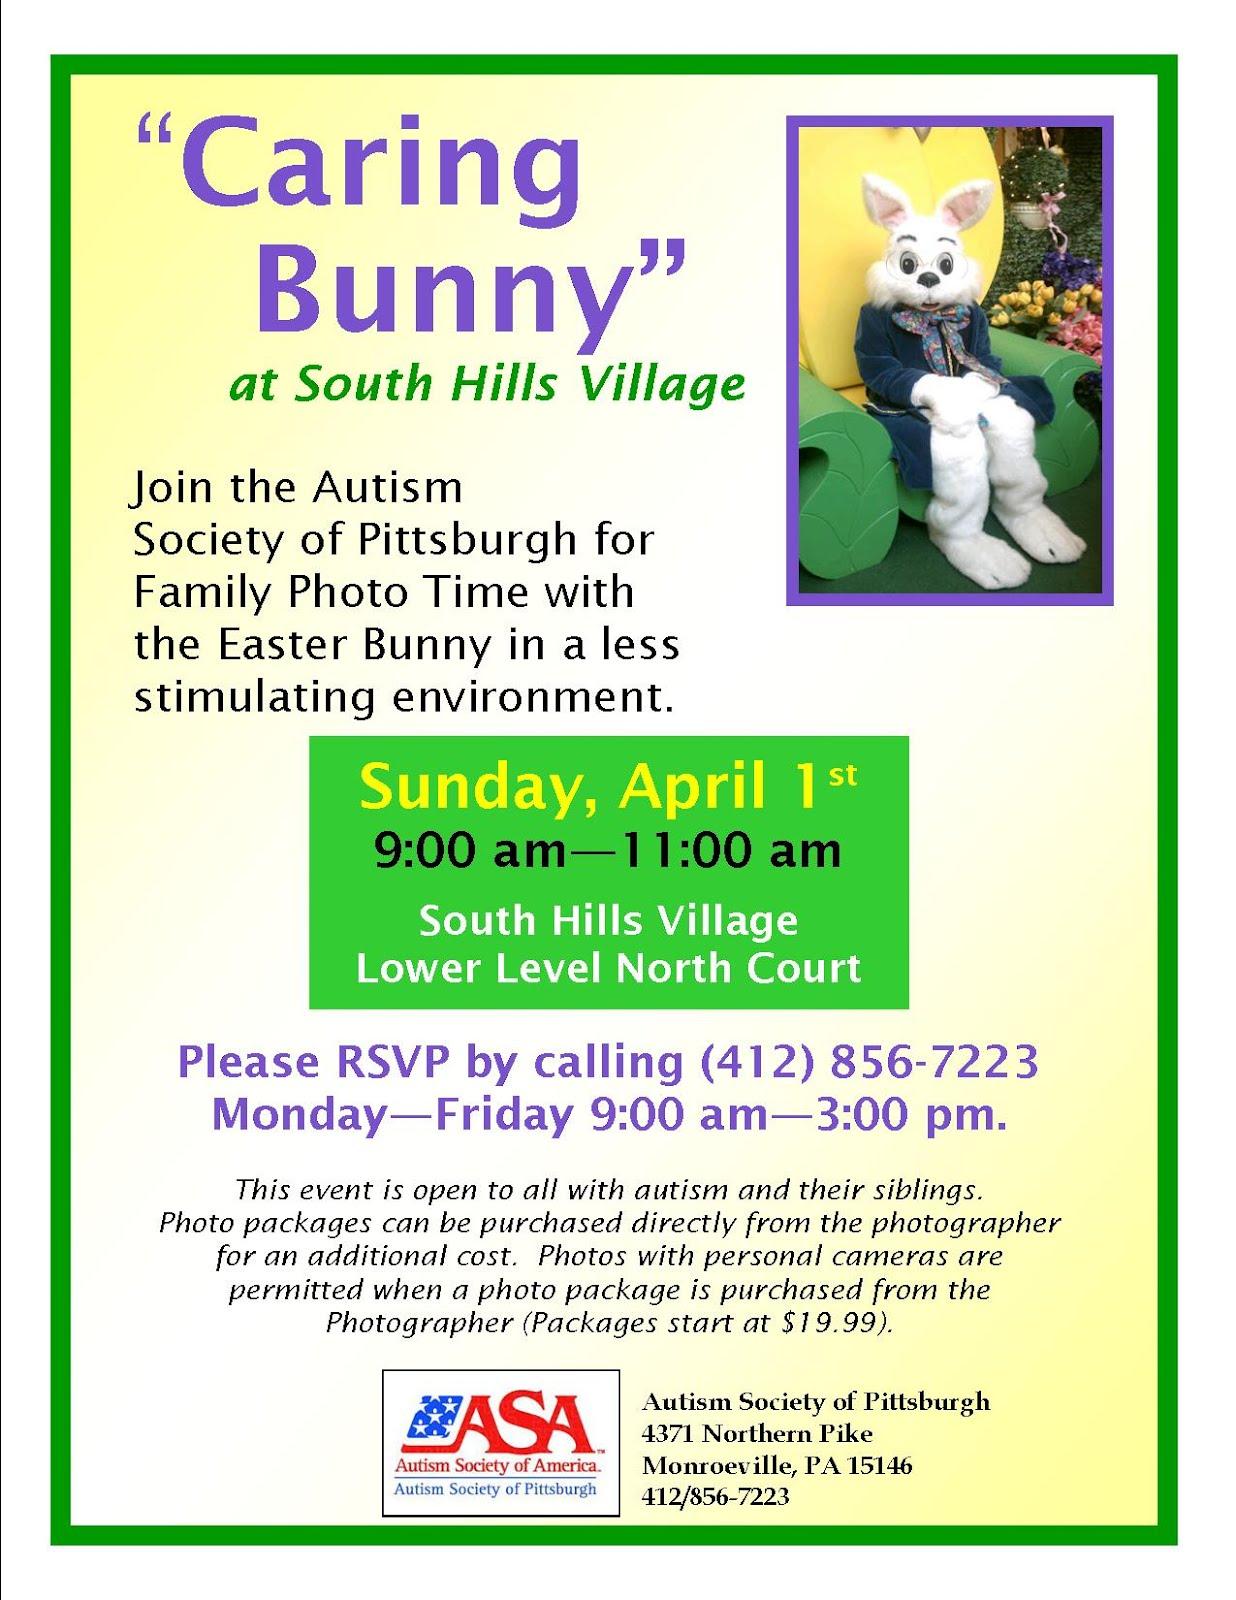 Caring bunny south hills village april 1 macaroni kid